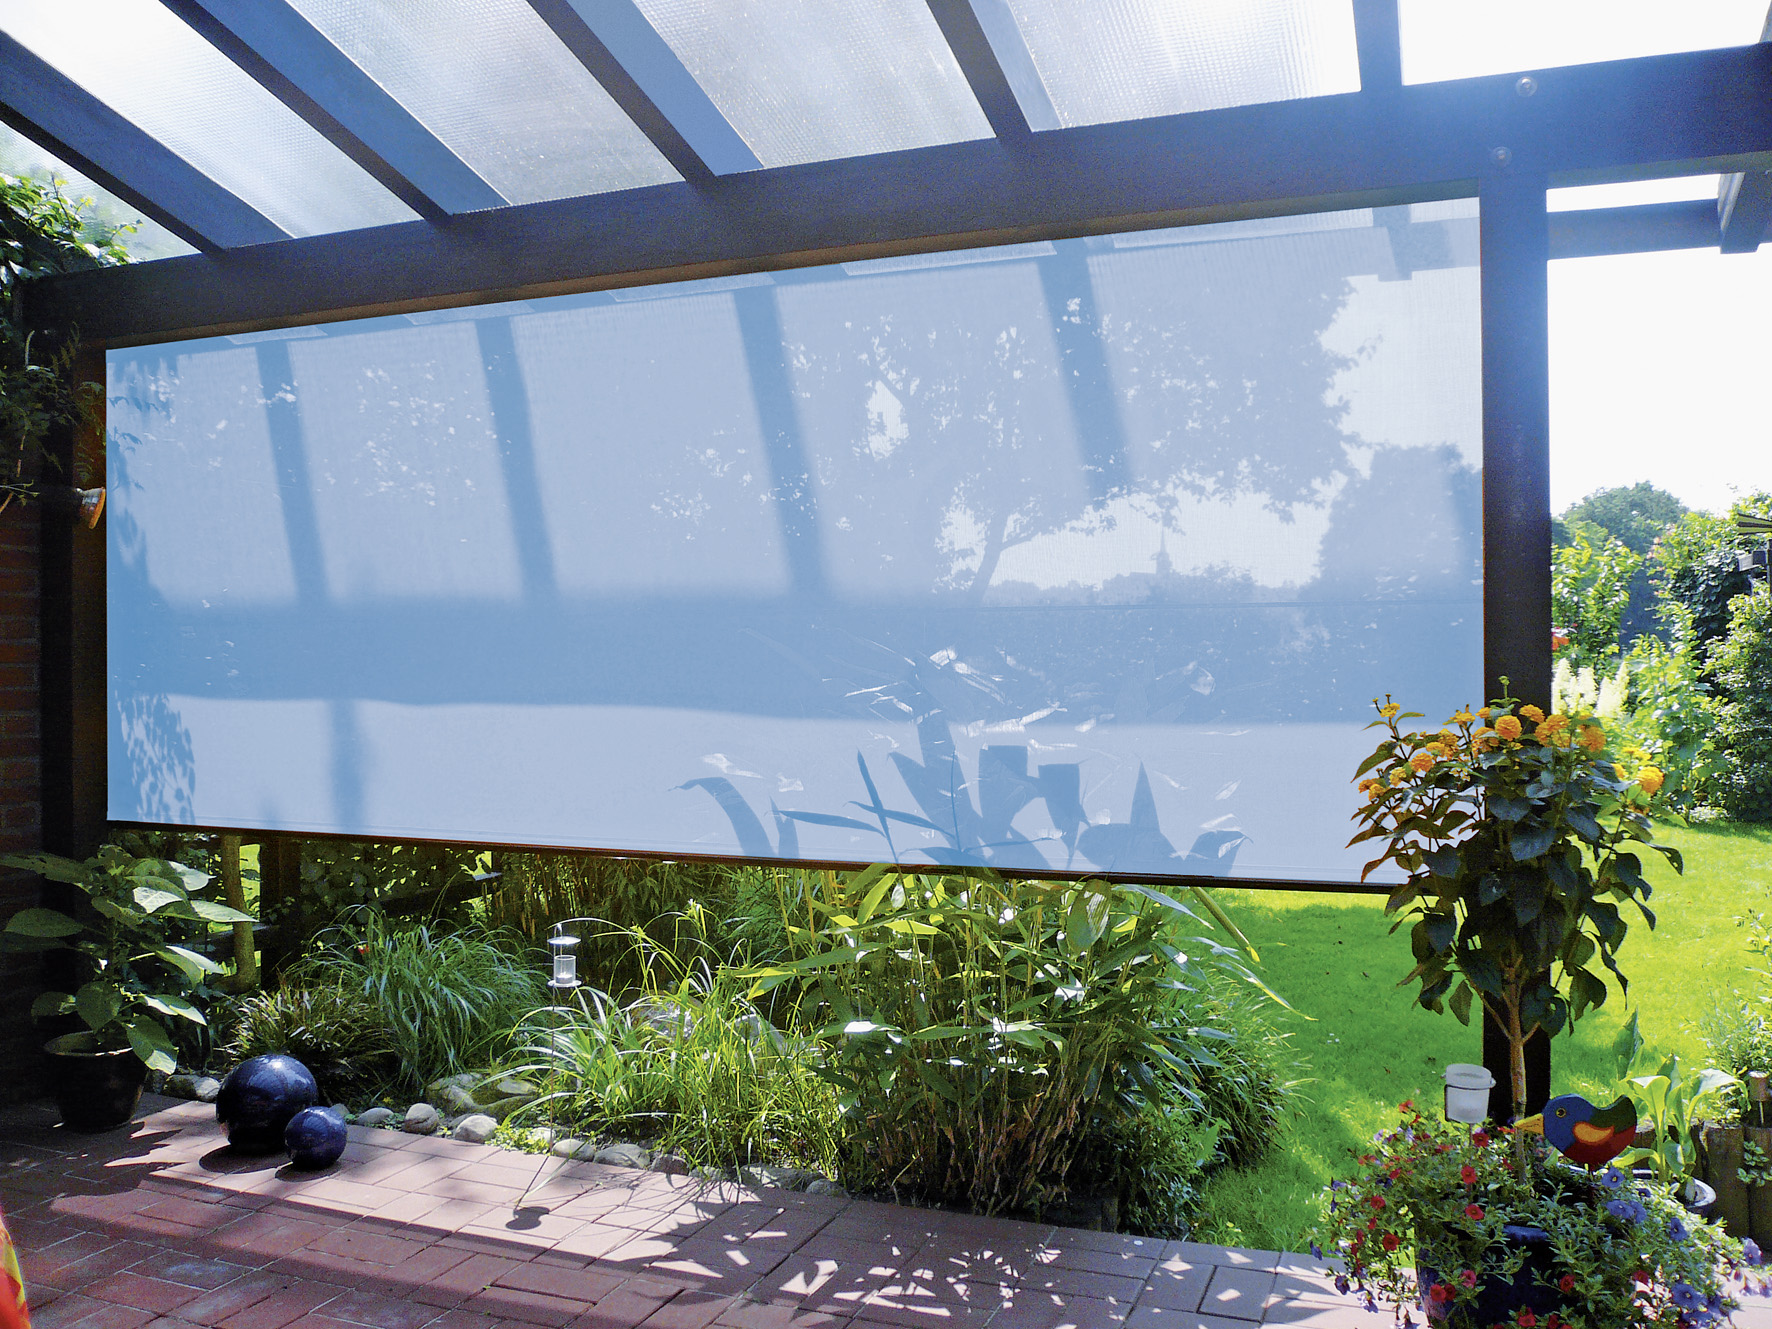 vertikaler sonnenschutz balkonsichtschutz sonnensegel quadrat rechteck windschutz sichtschutz. Black Bedroom Furniture Sets. Home Design Ideas